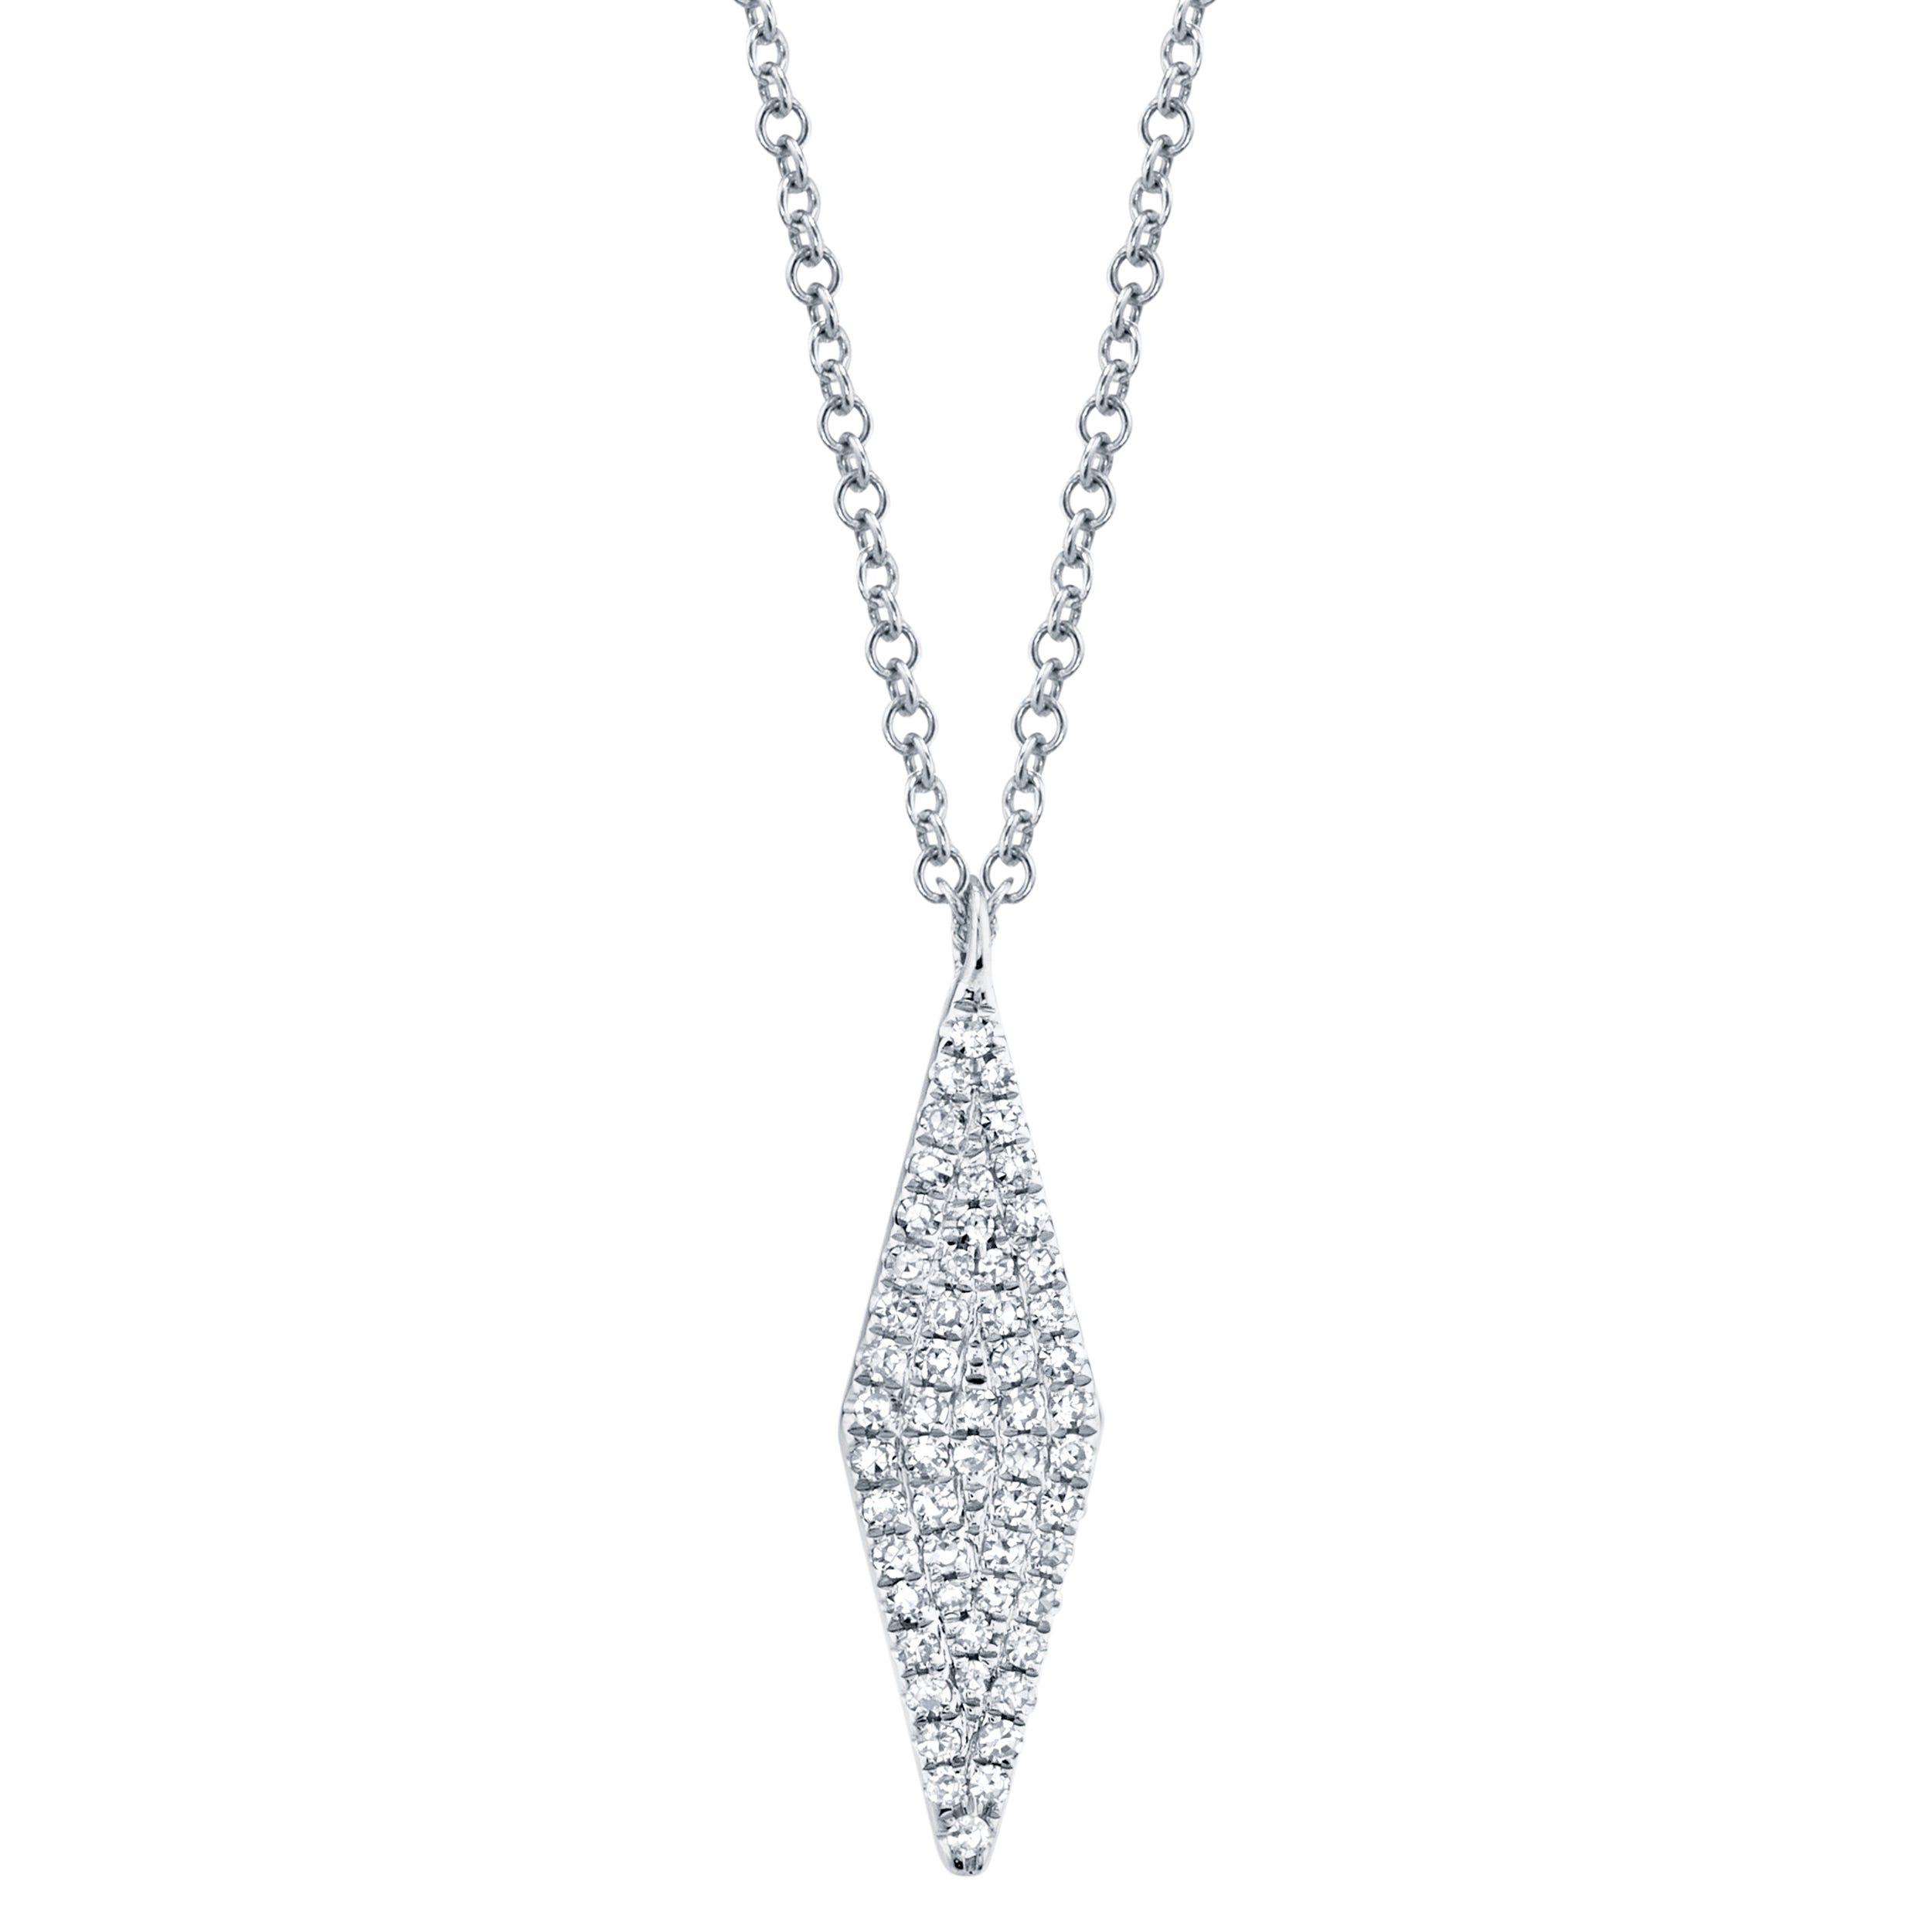 Shy Creation Diamond Kite Cluster Pendant in 14k White Gold SC55001716